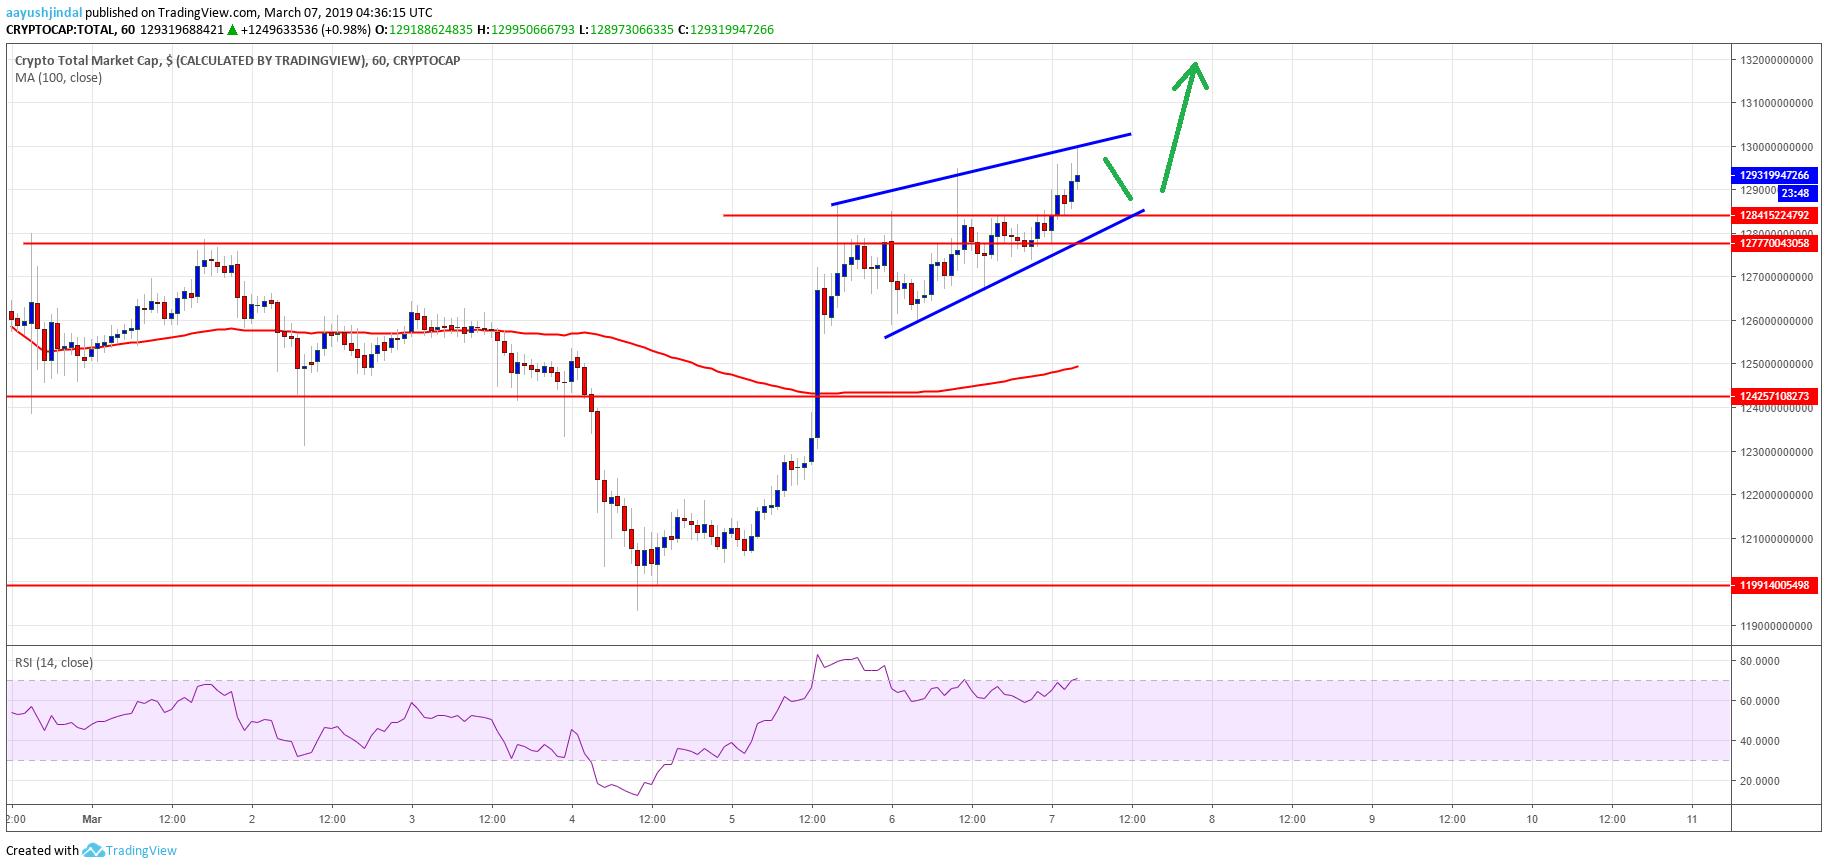 Crypto Market Cap Binance Coin BNB Bitcoin Cash BCH TRX Litecoin